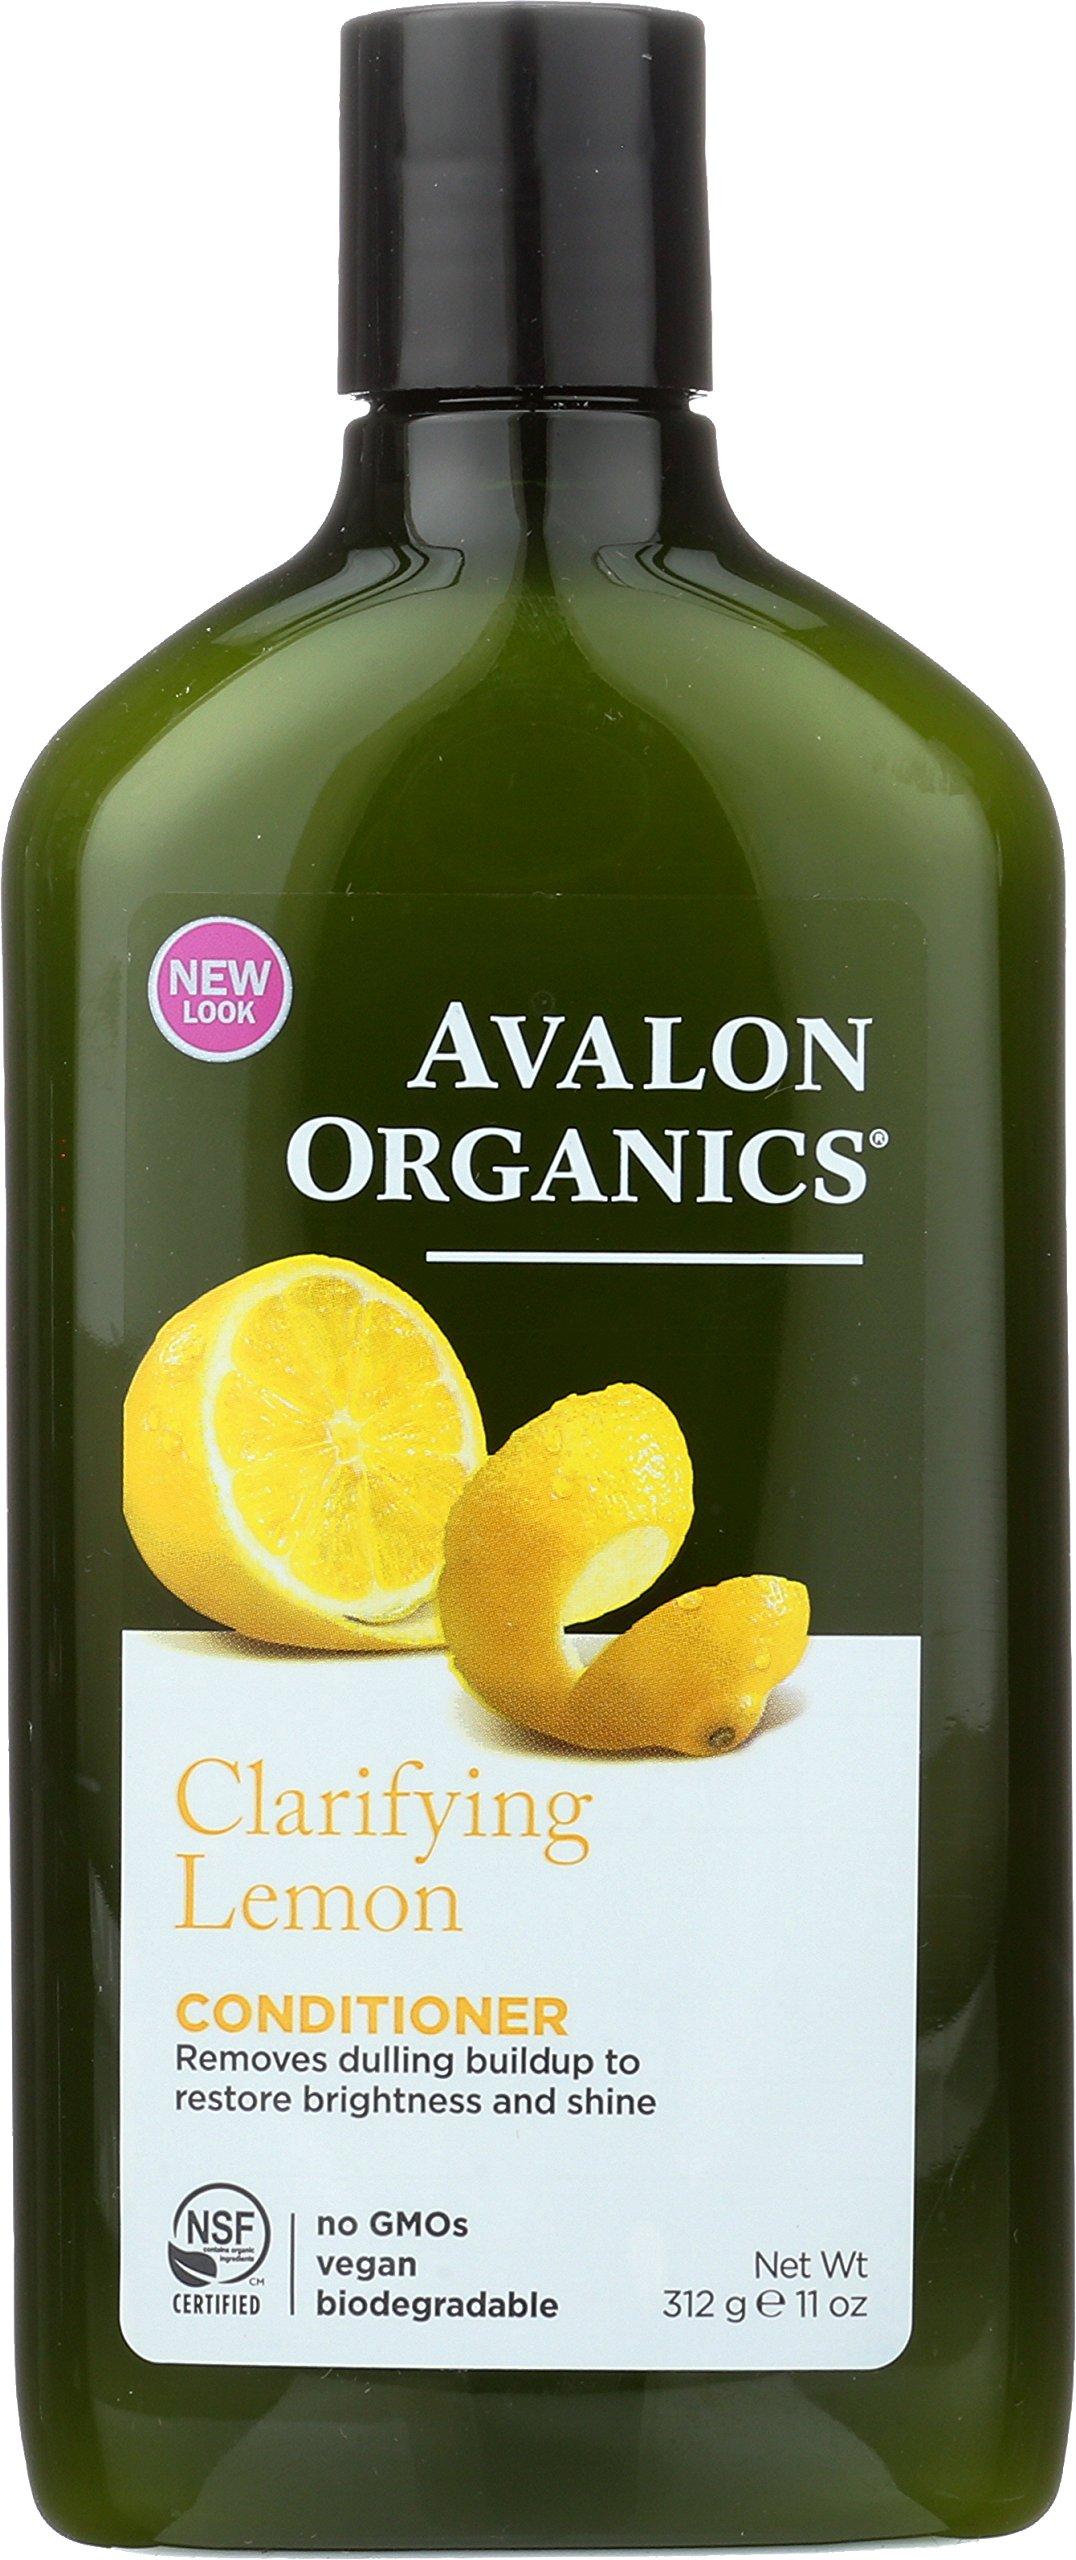 Avalon Organics Clarifying Lemon Conditioner, 11 oz.